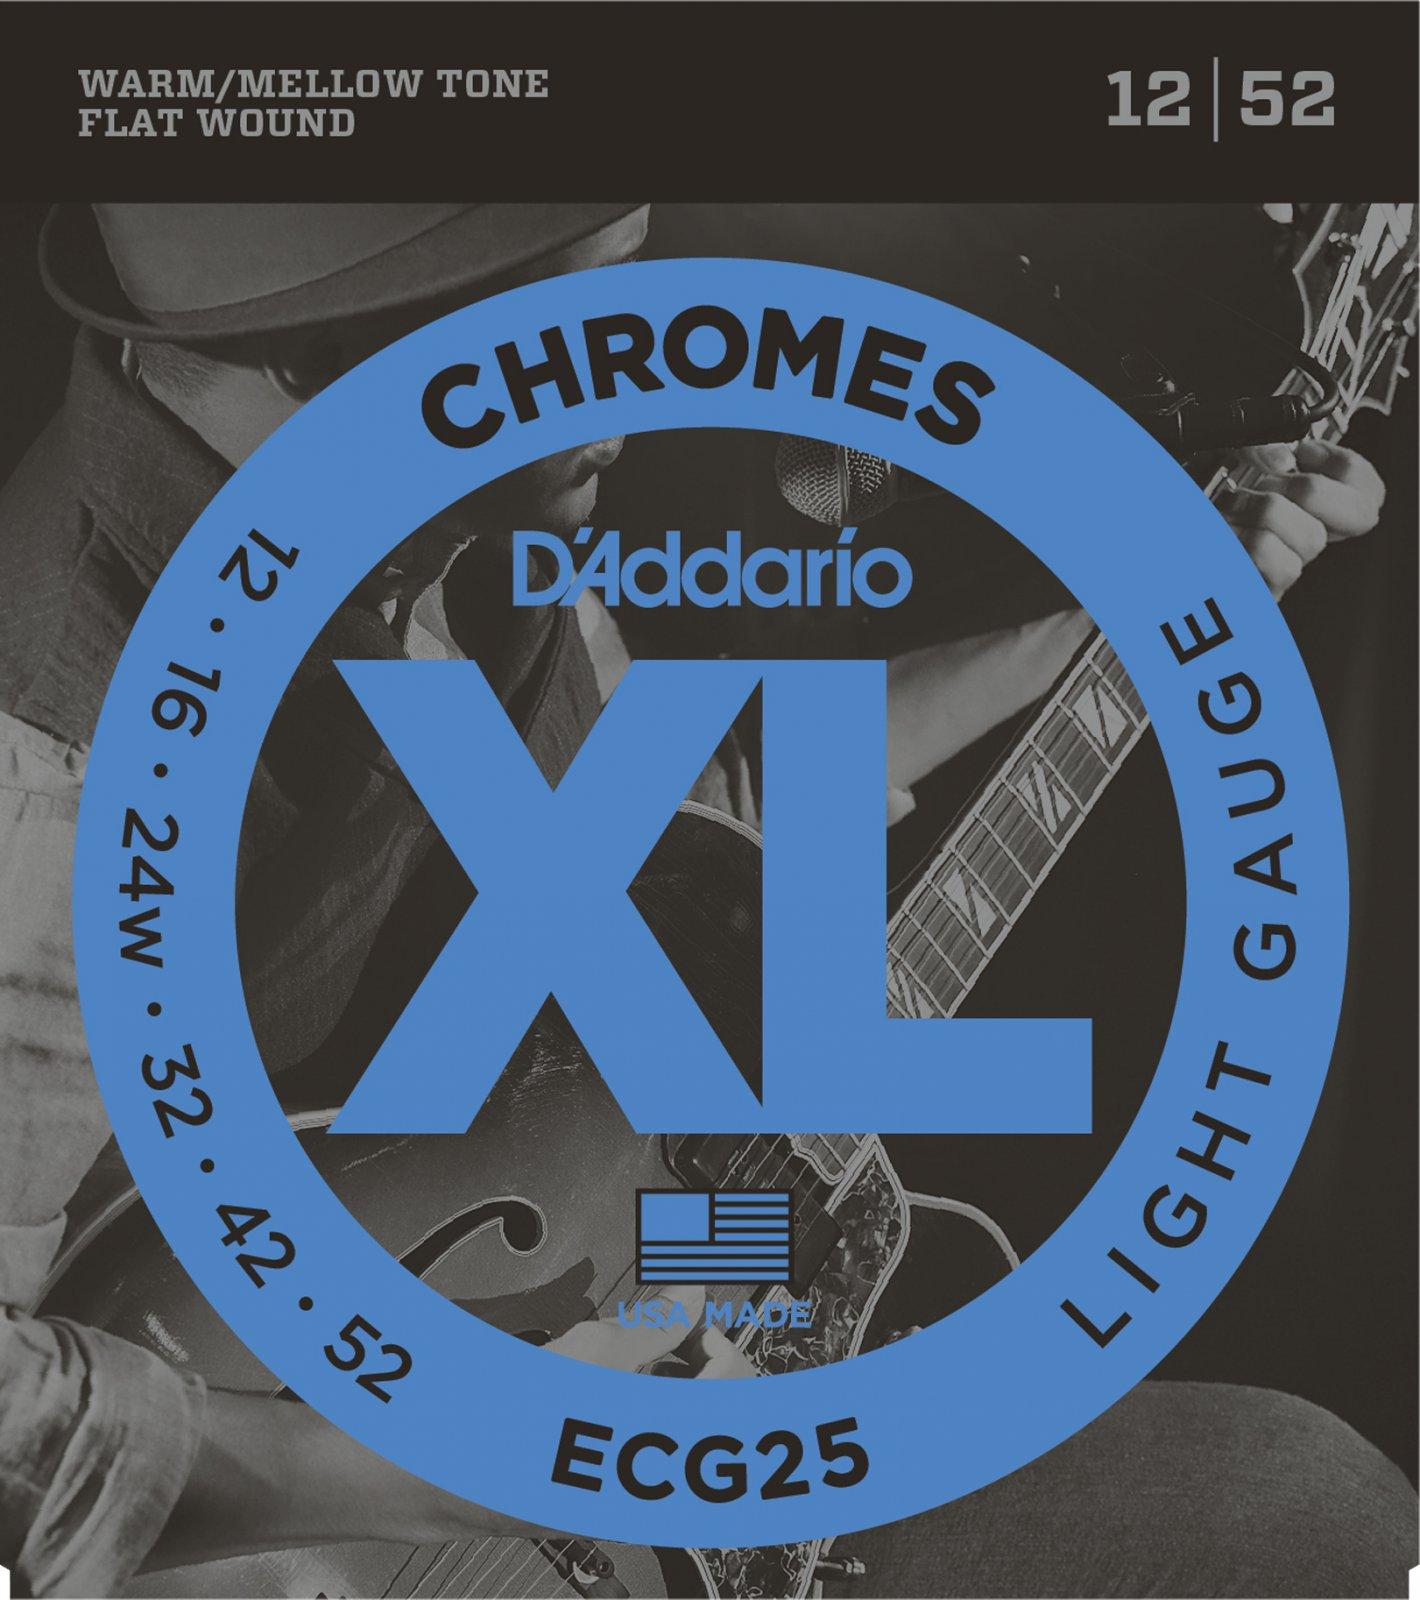 D'Addario XL Chromes ECG25 Flat Wound Electric Guitar Strings, Light, 12-52